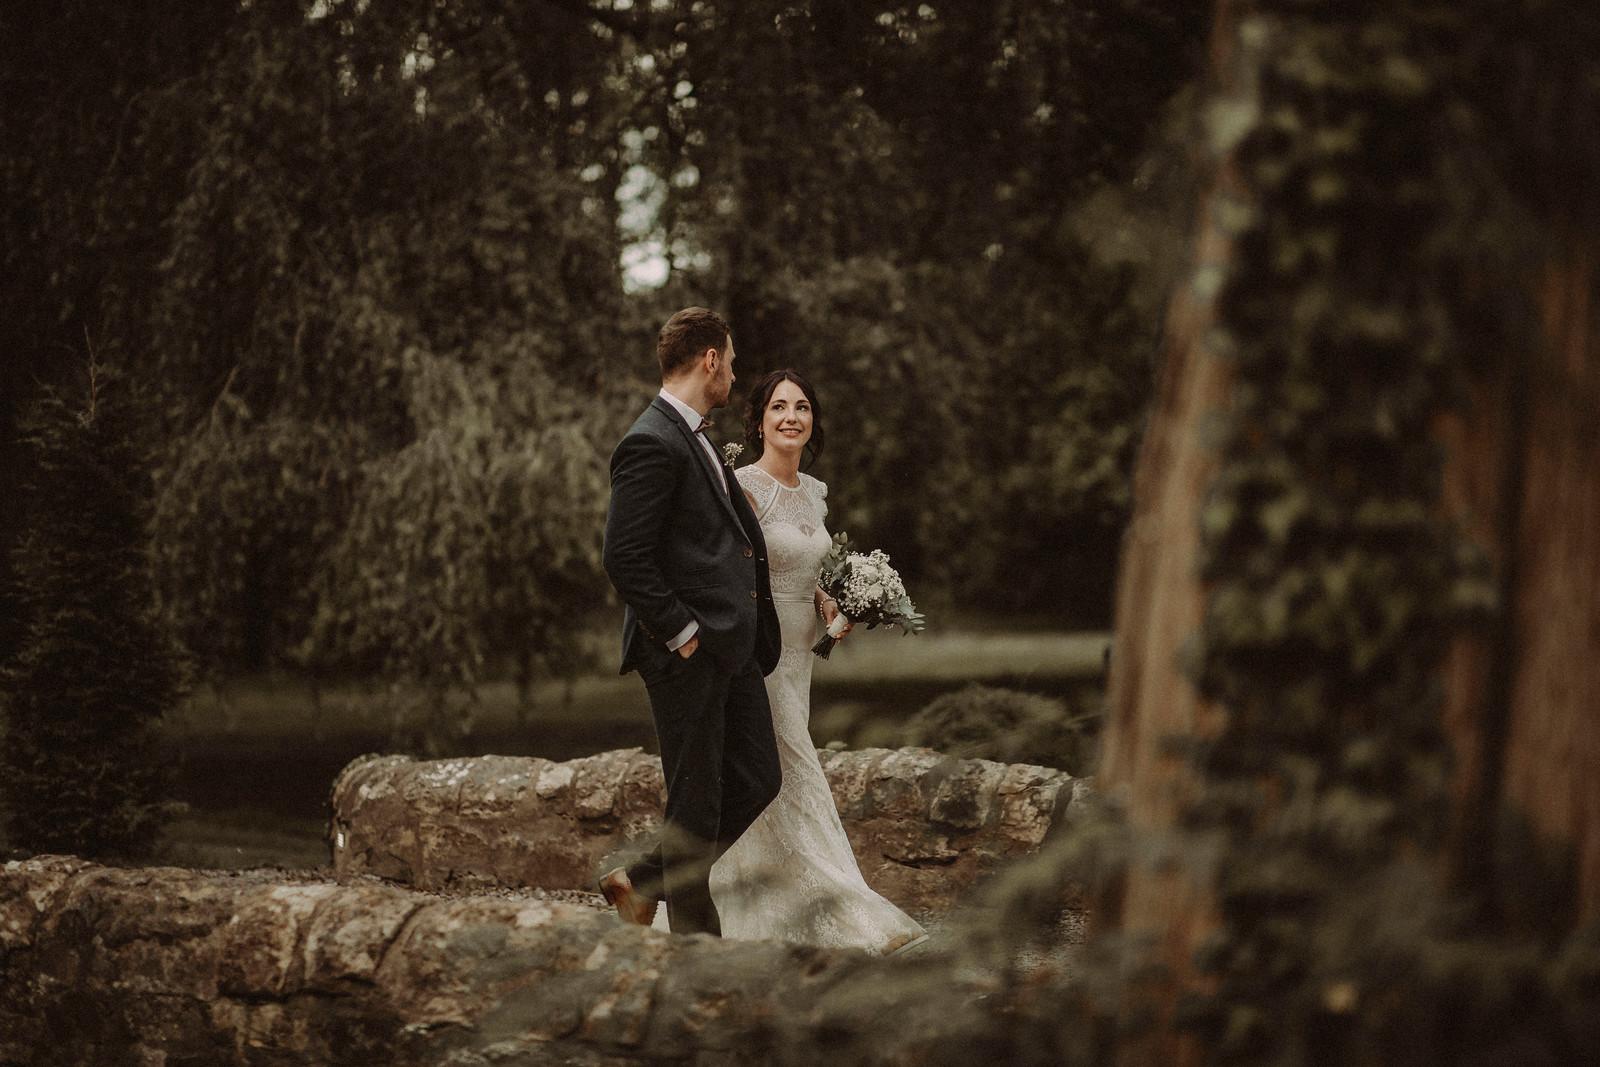 Rustic Theme Wedding Photo of Bride and Groom